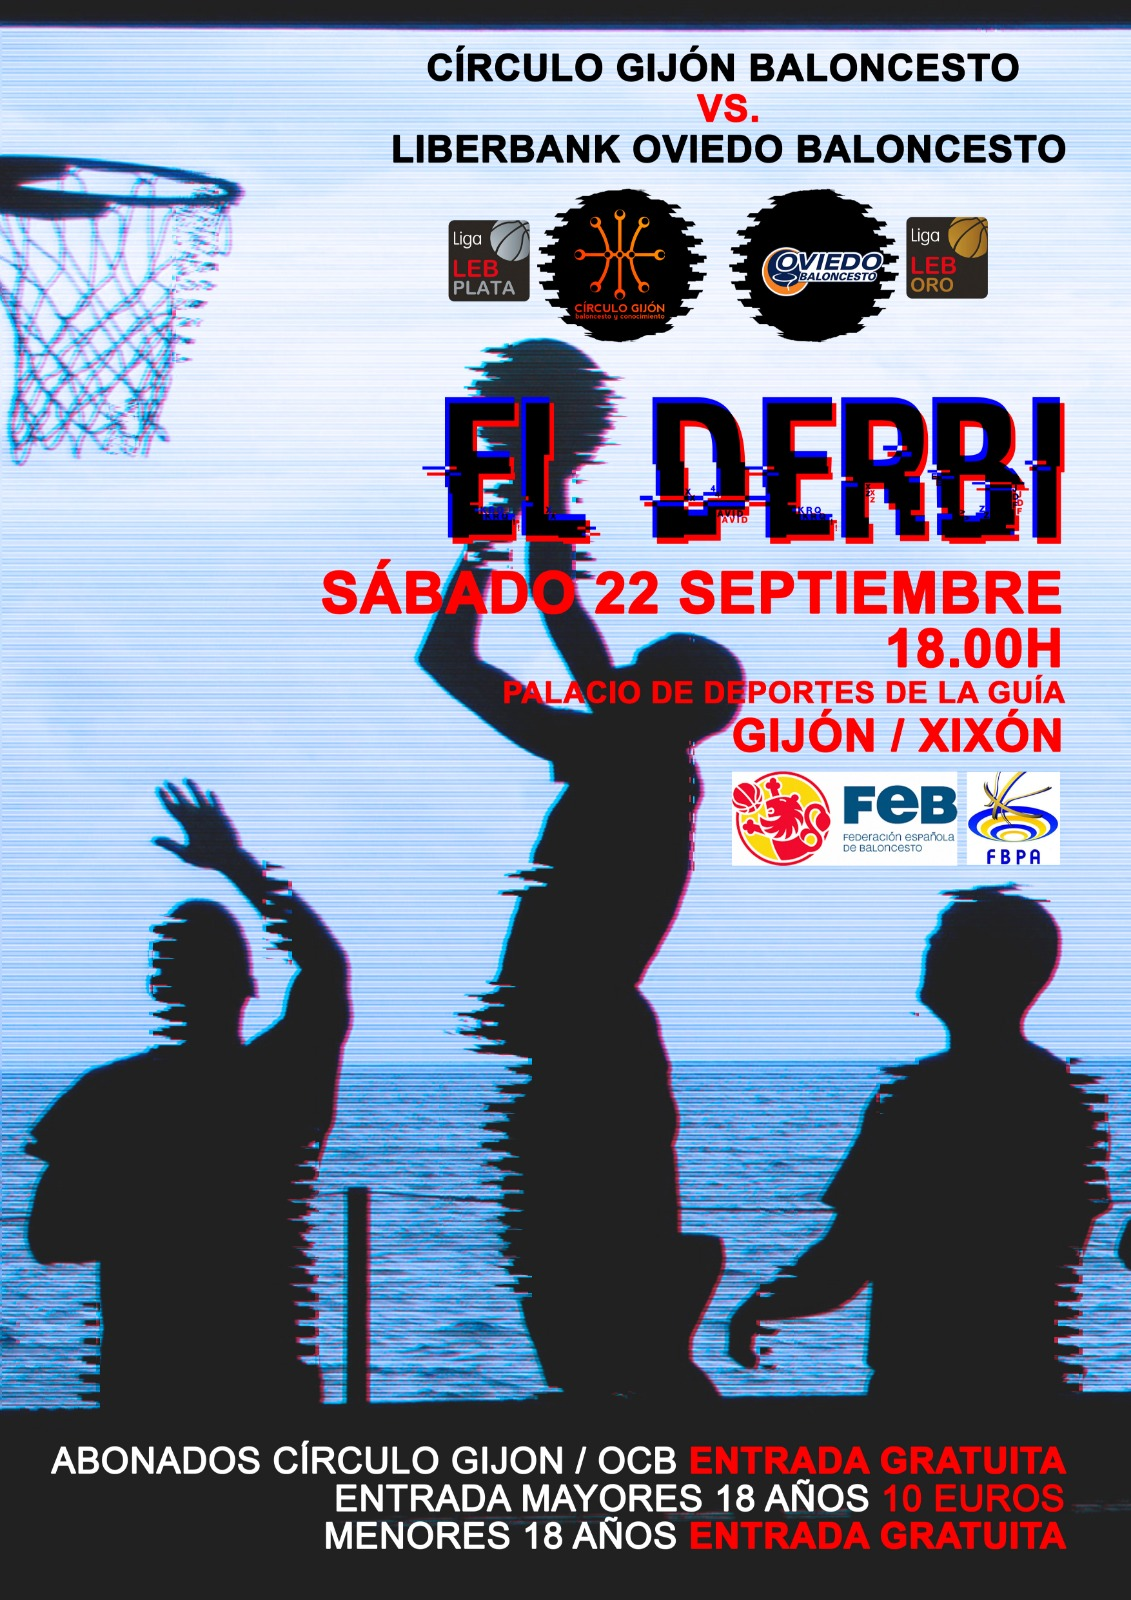 Derbi Círculo Gijón Oviedo Baloncesto 2018